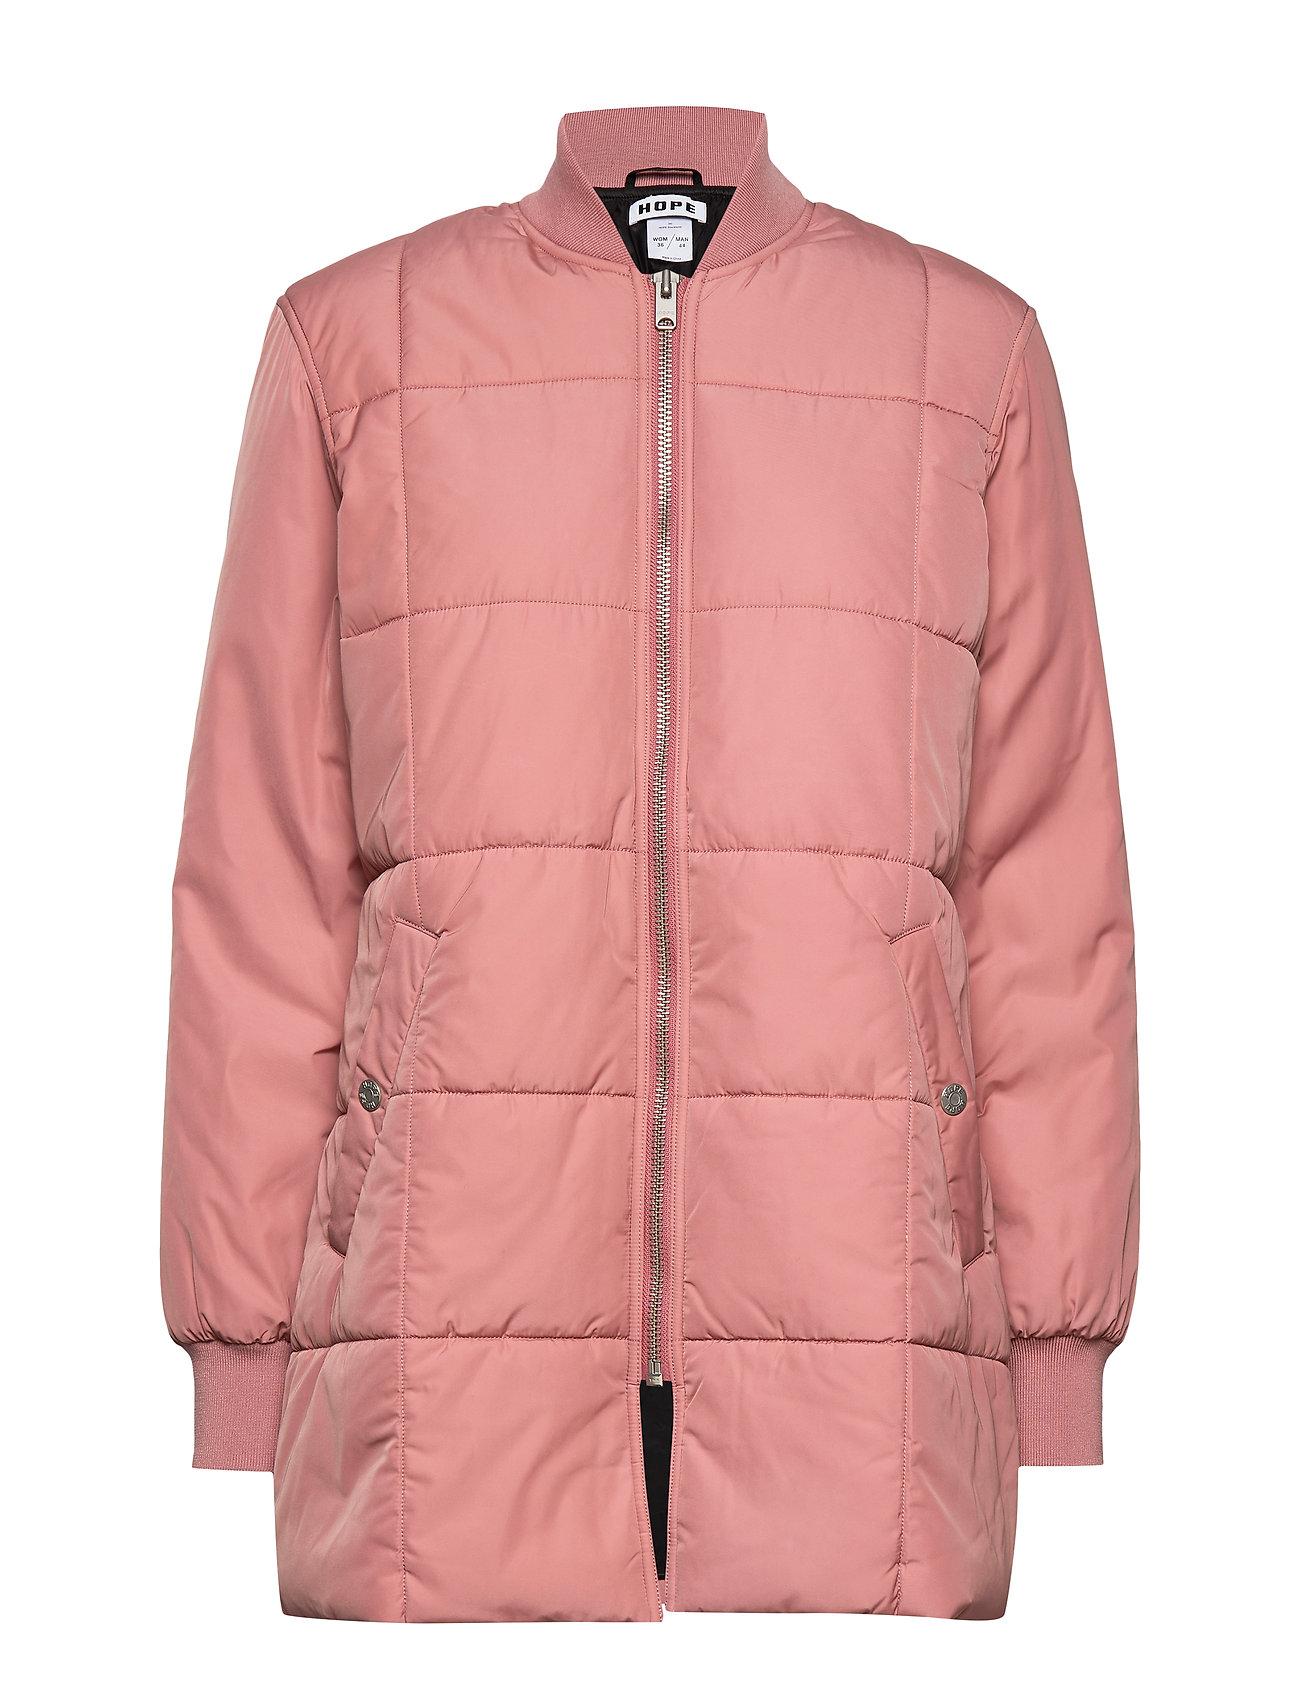 Hope Abbey Jacket - PINK